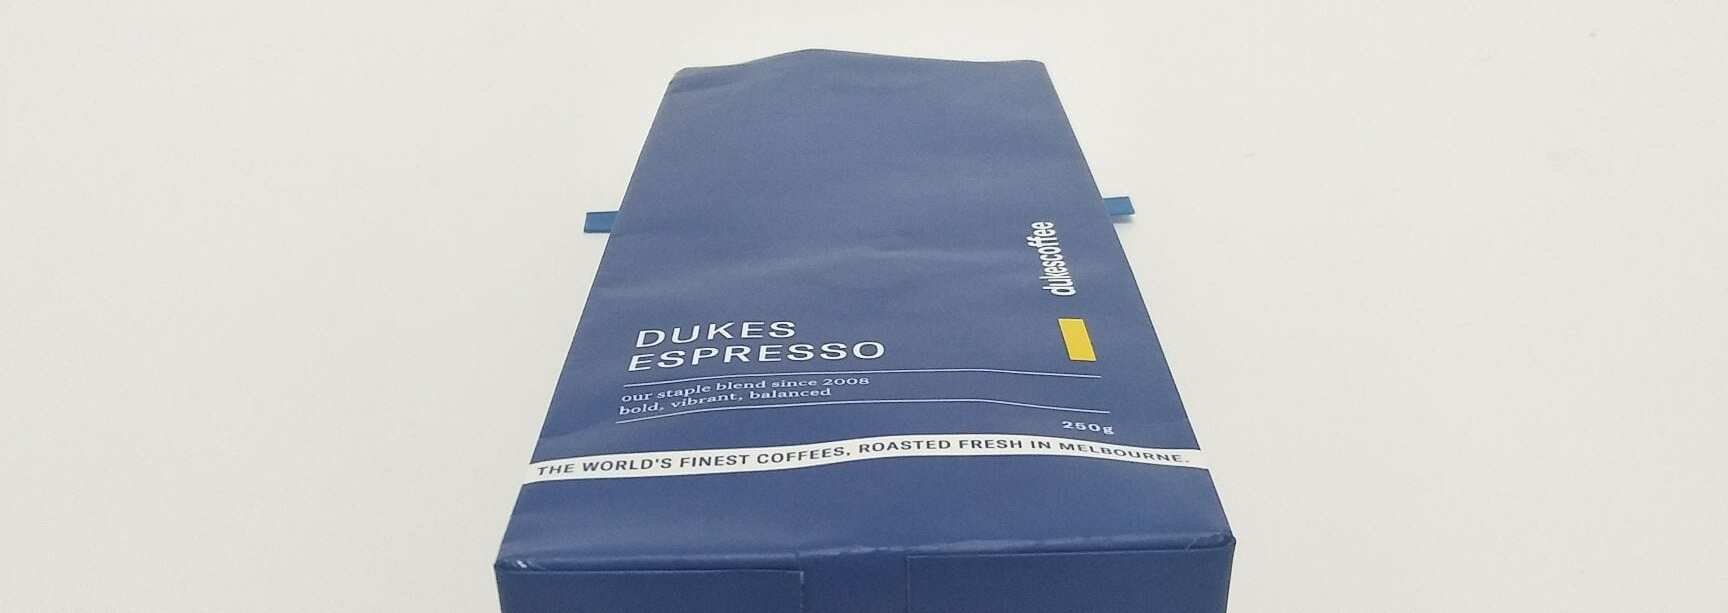 A blue coffee bag